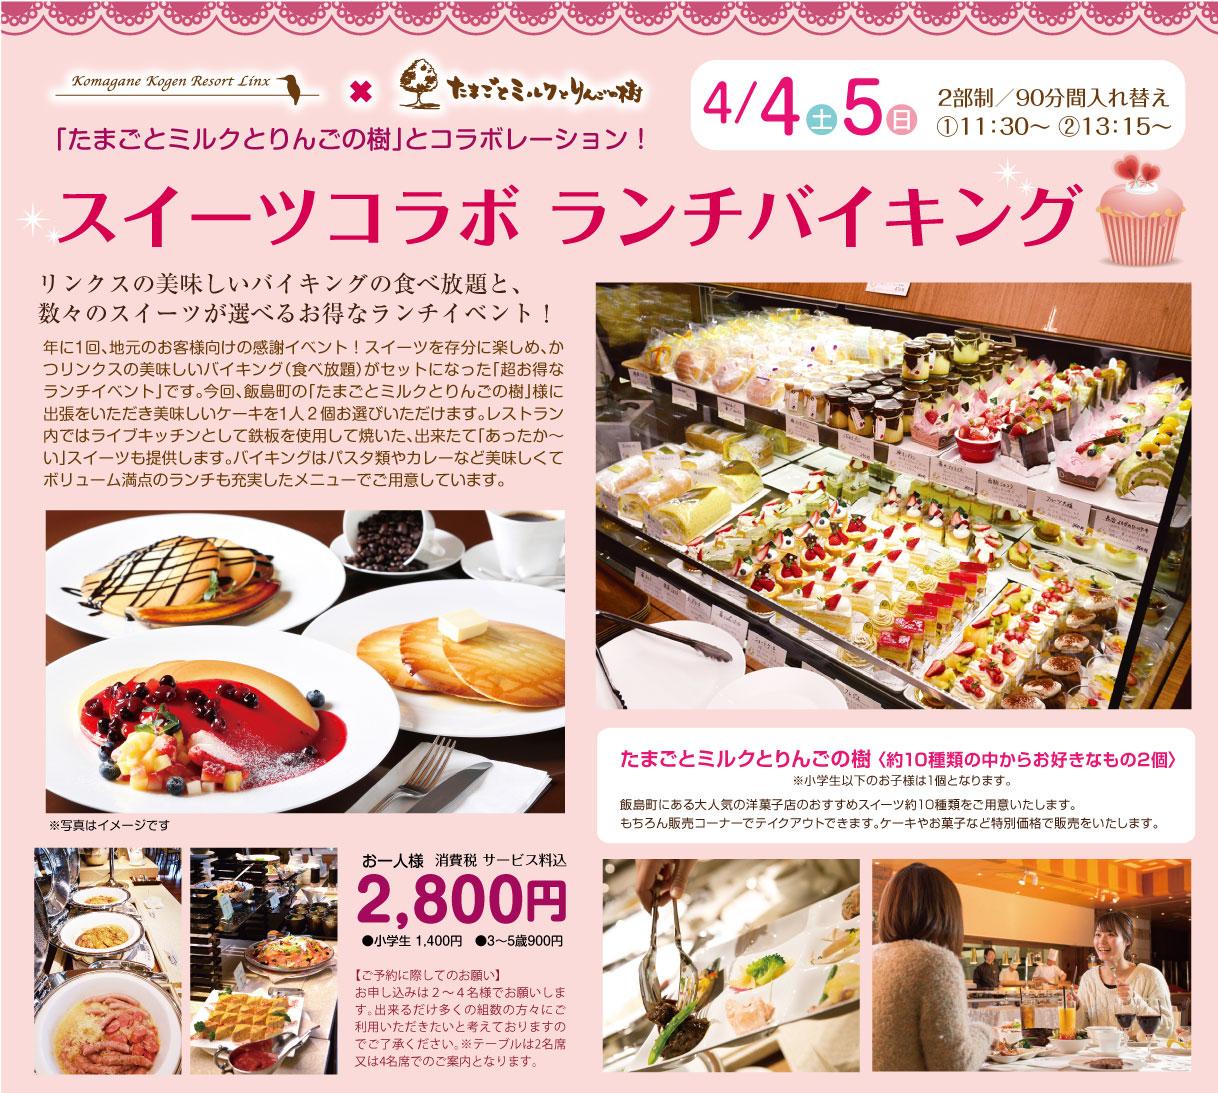 http://www.komagane-linx.co.jp/blogimages/%E3%83%AA%E3%83%B3%E3%82%AF%E3%82%B91504_03.jpg